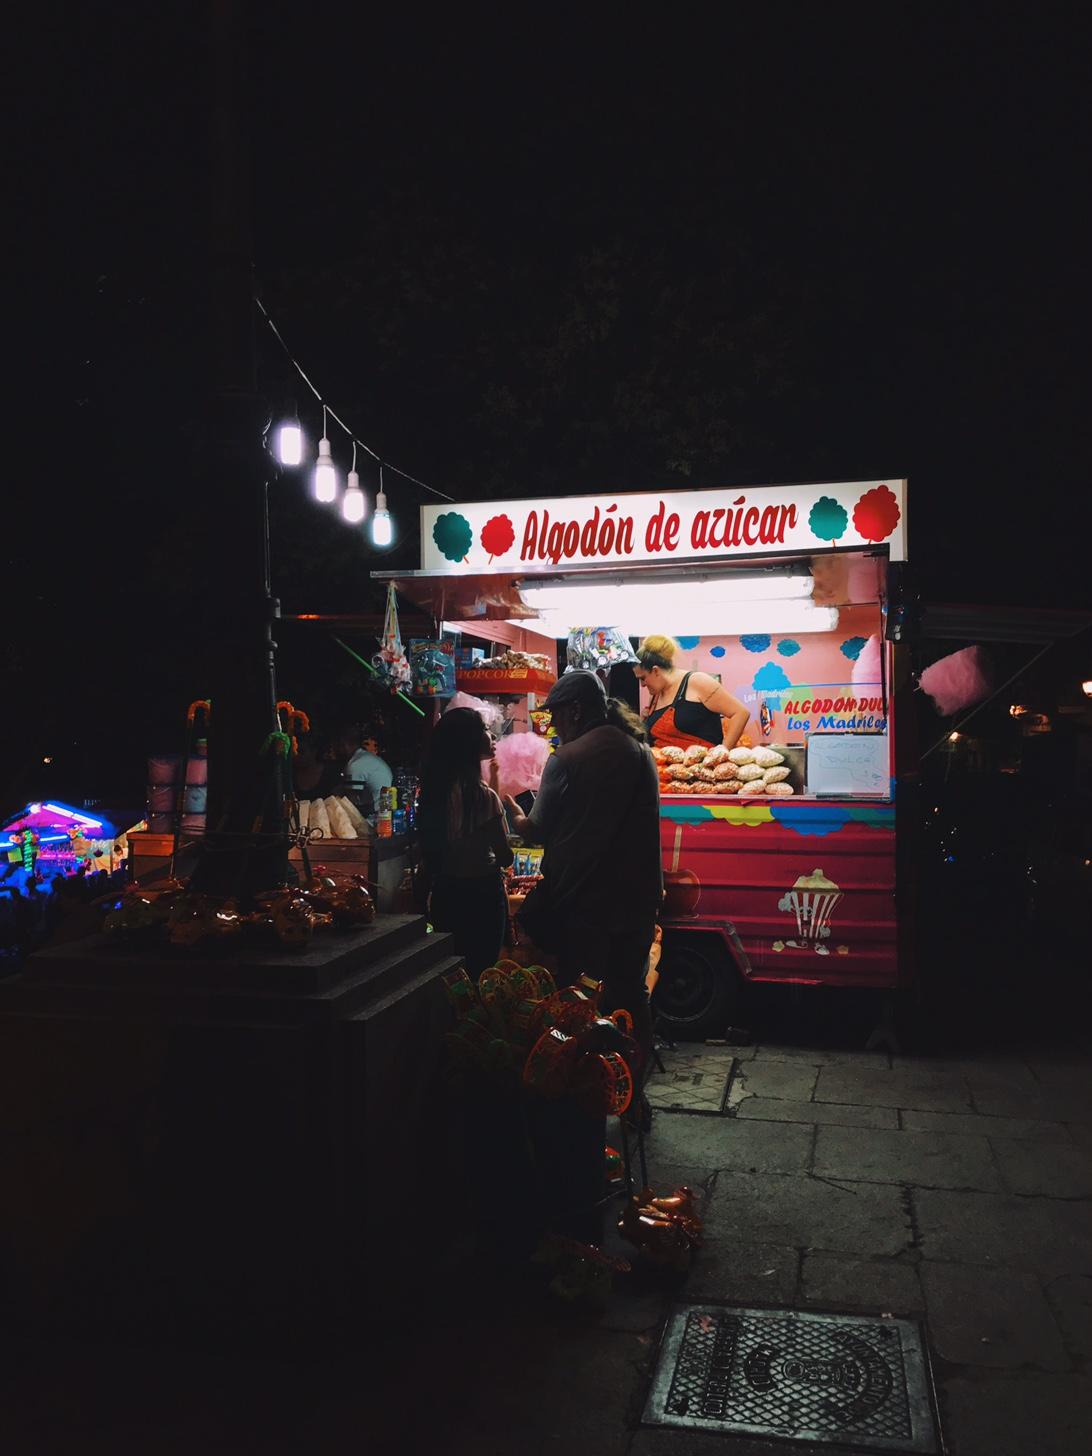 Street food around the streets of La Latina during La Paloma.